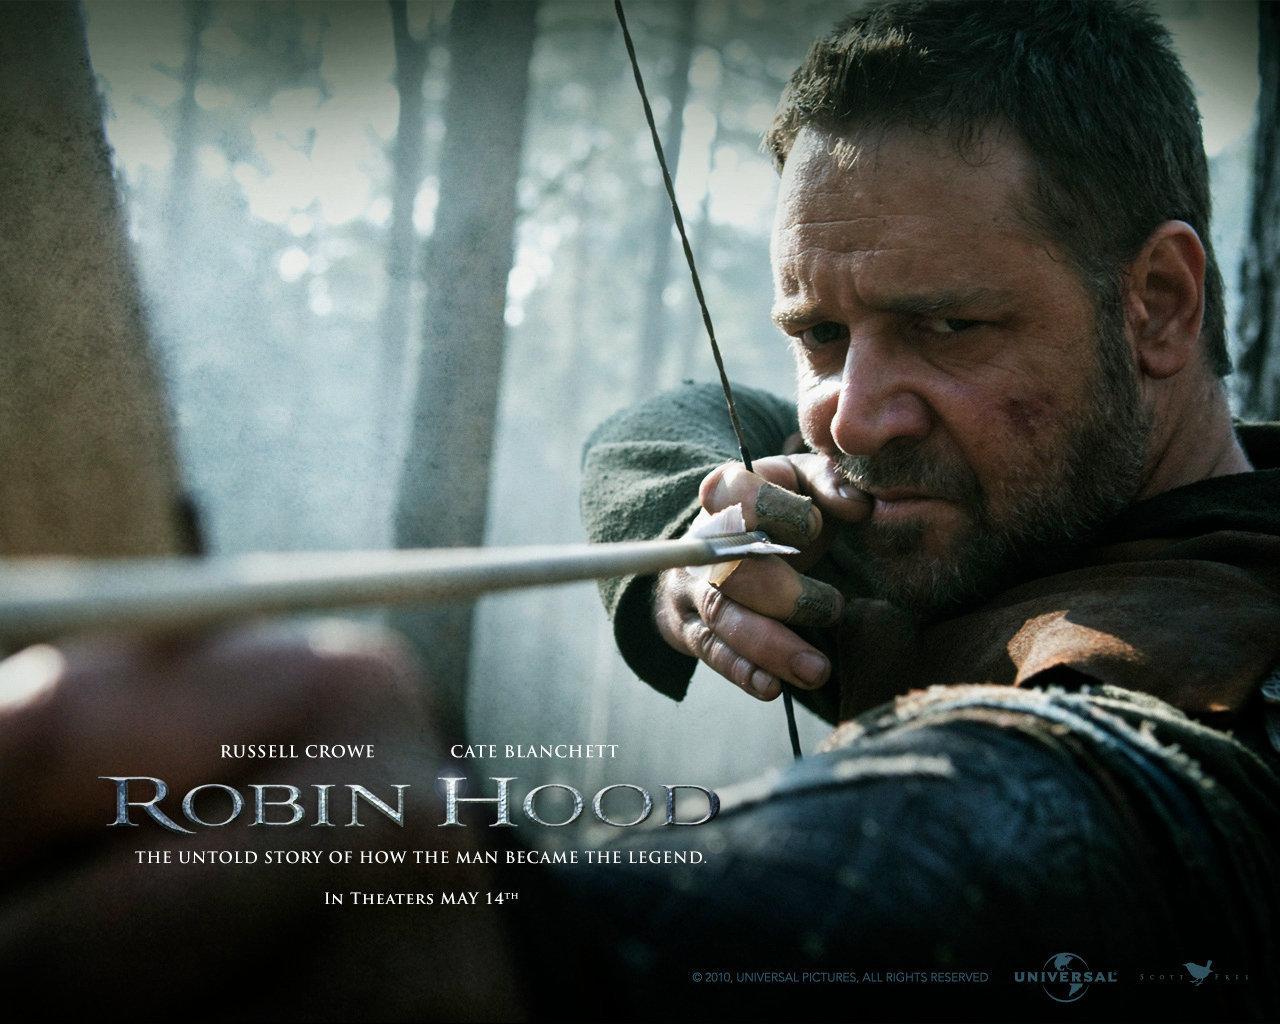 Robin Hood (2010) images Robin Hood (2010) HD wallpaper ...